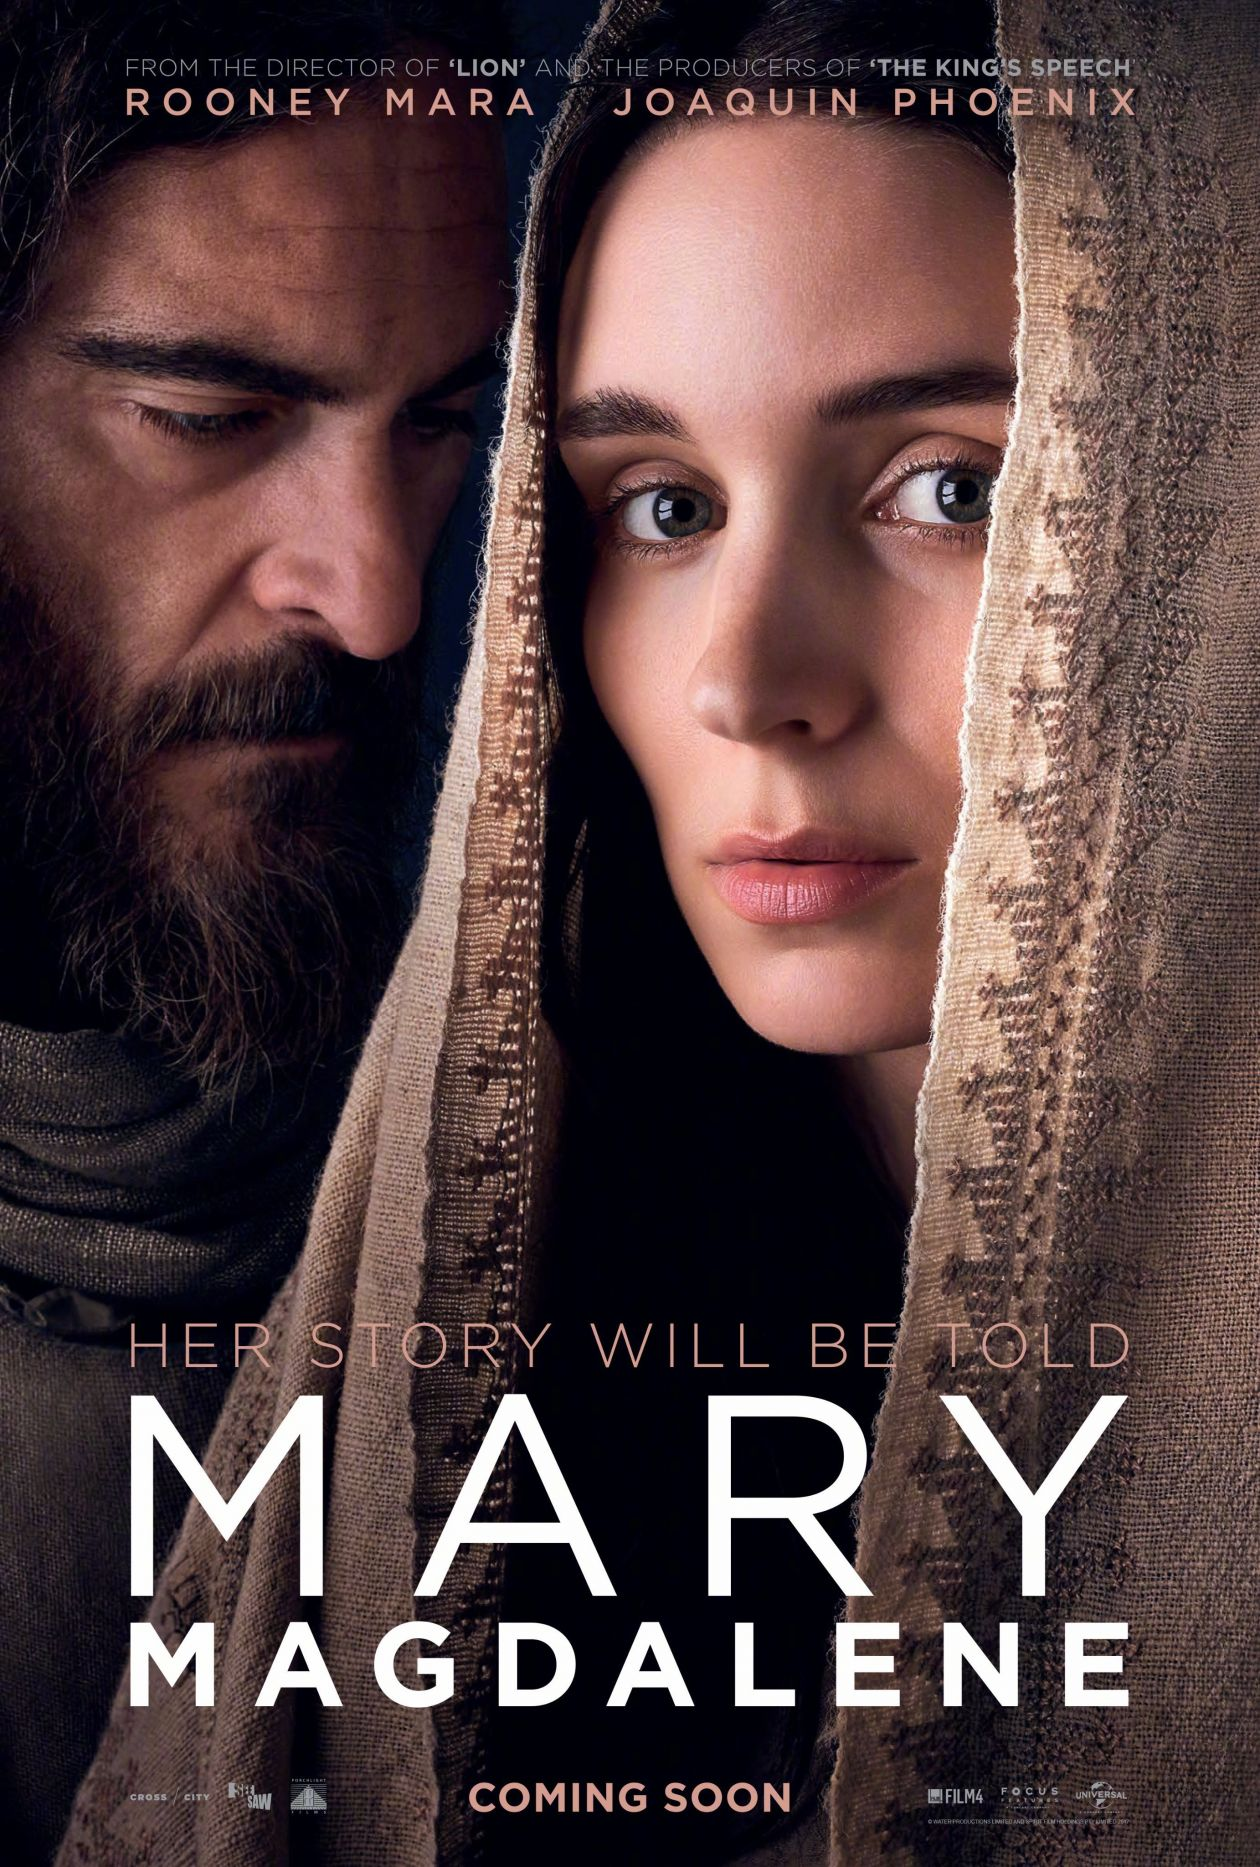 Rooney Mara actress / Joaquin Phoenix | Mary Magdalene / Garth Davis 2018 Movie Poster Affiche Film